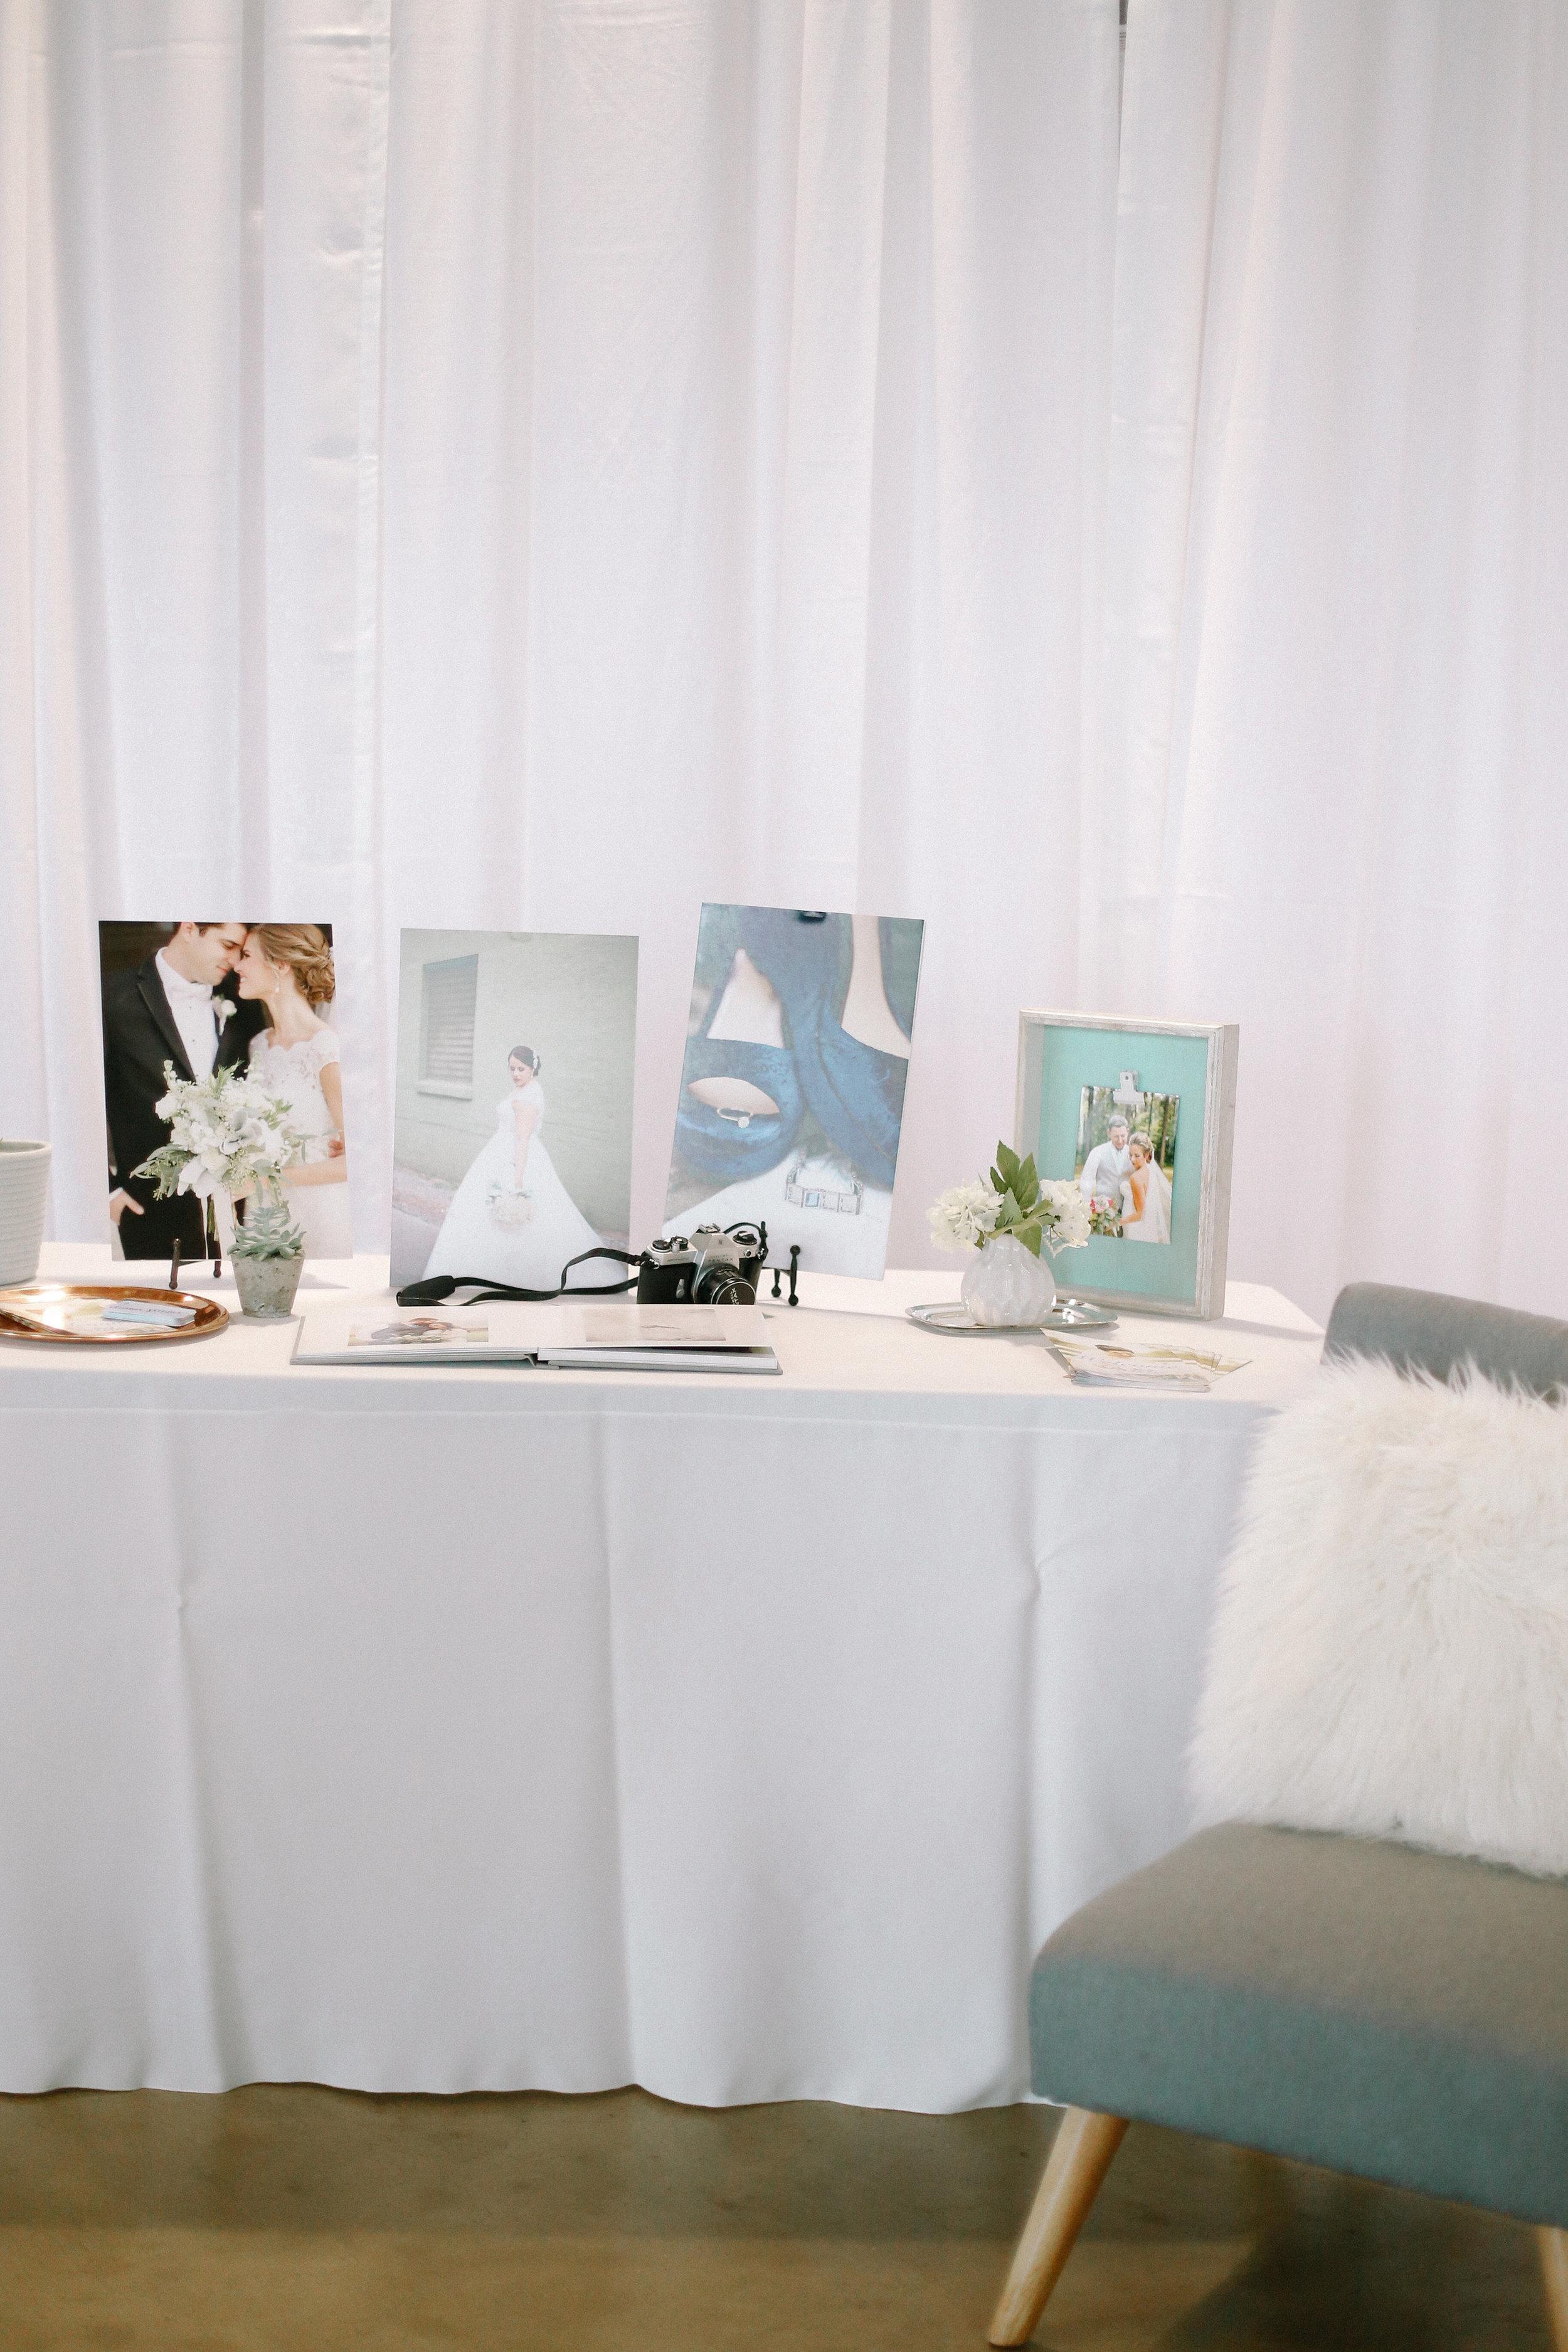 Engaged Event-Engaged Event-0082.jpg